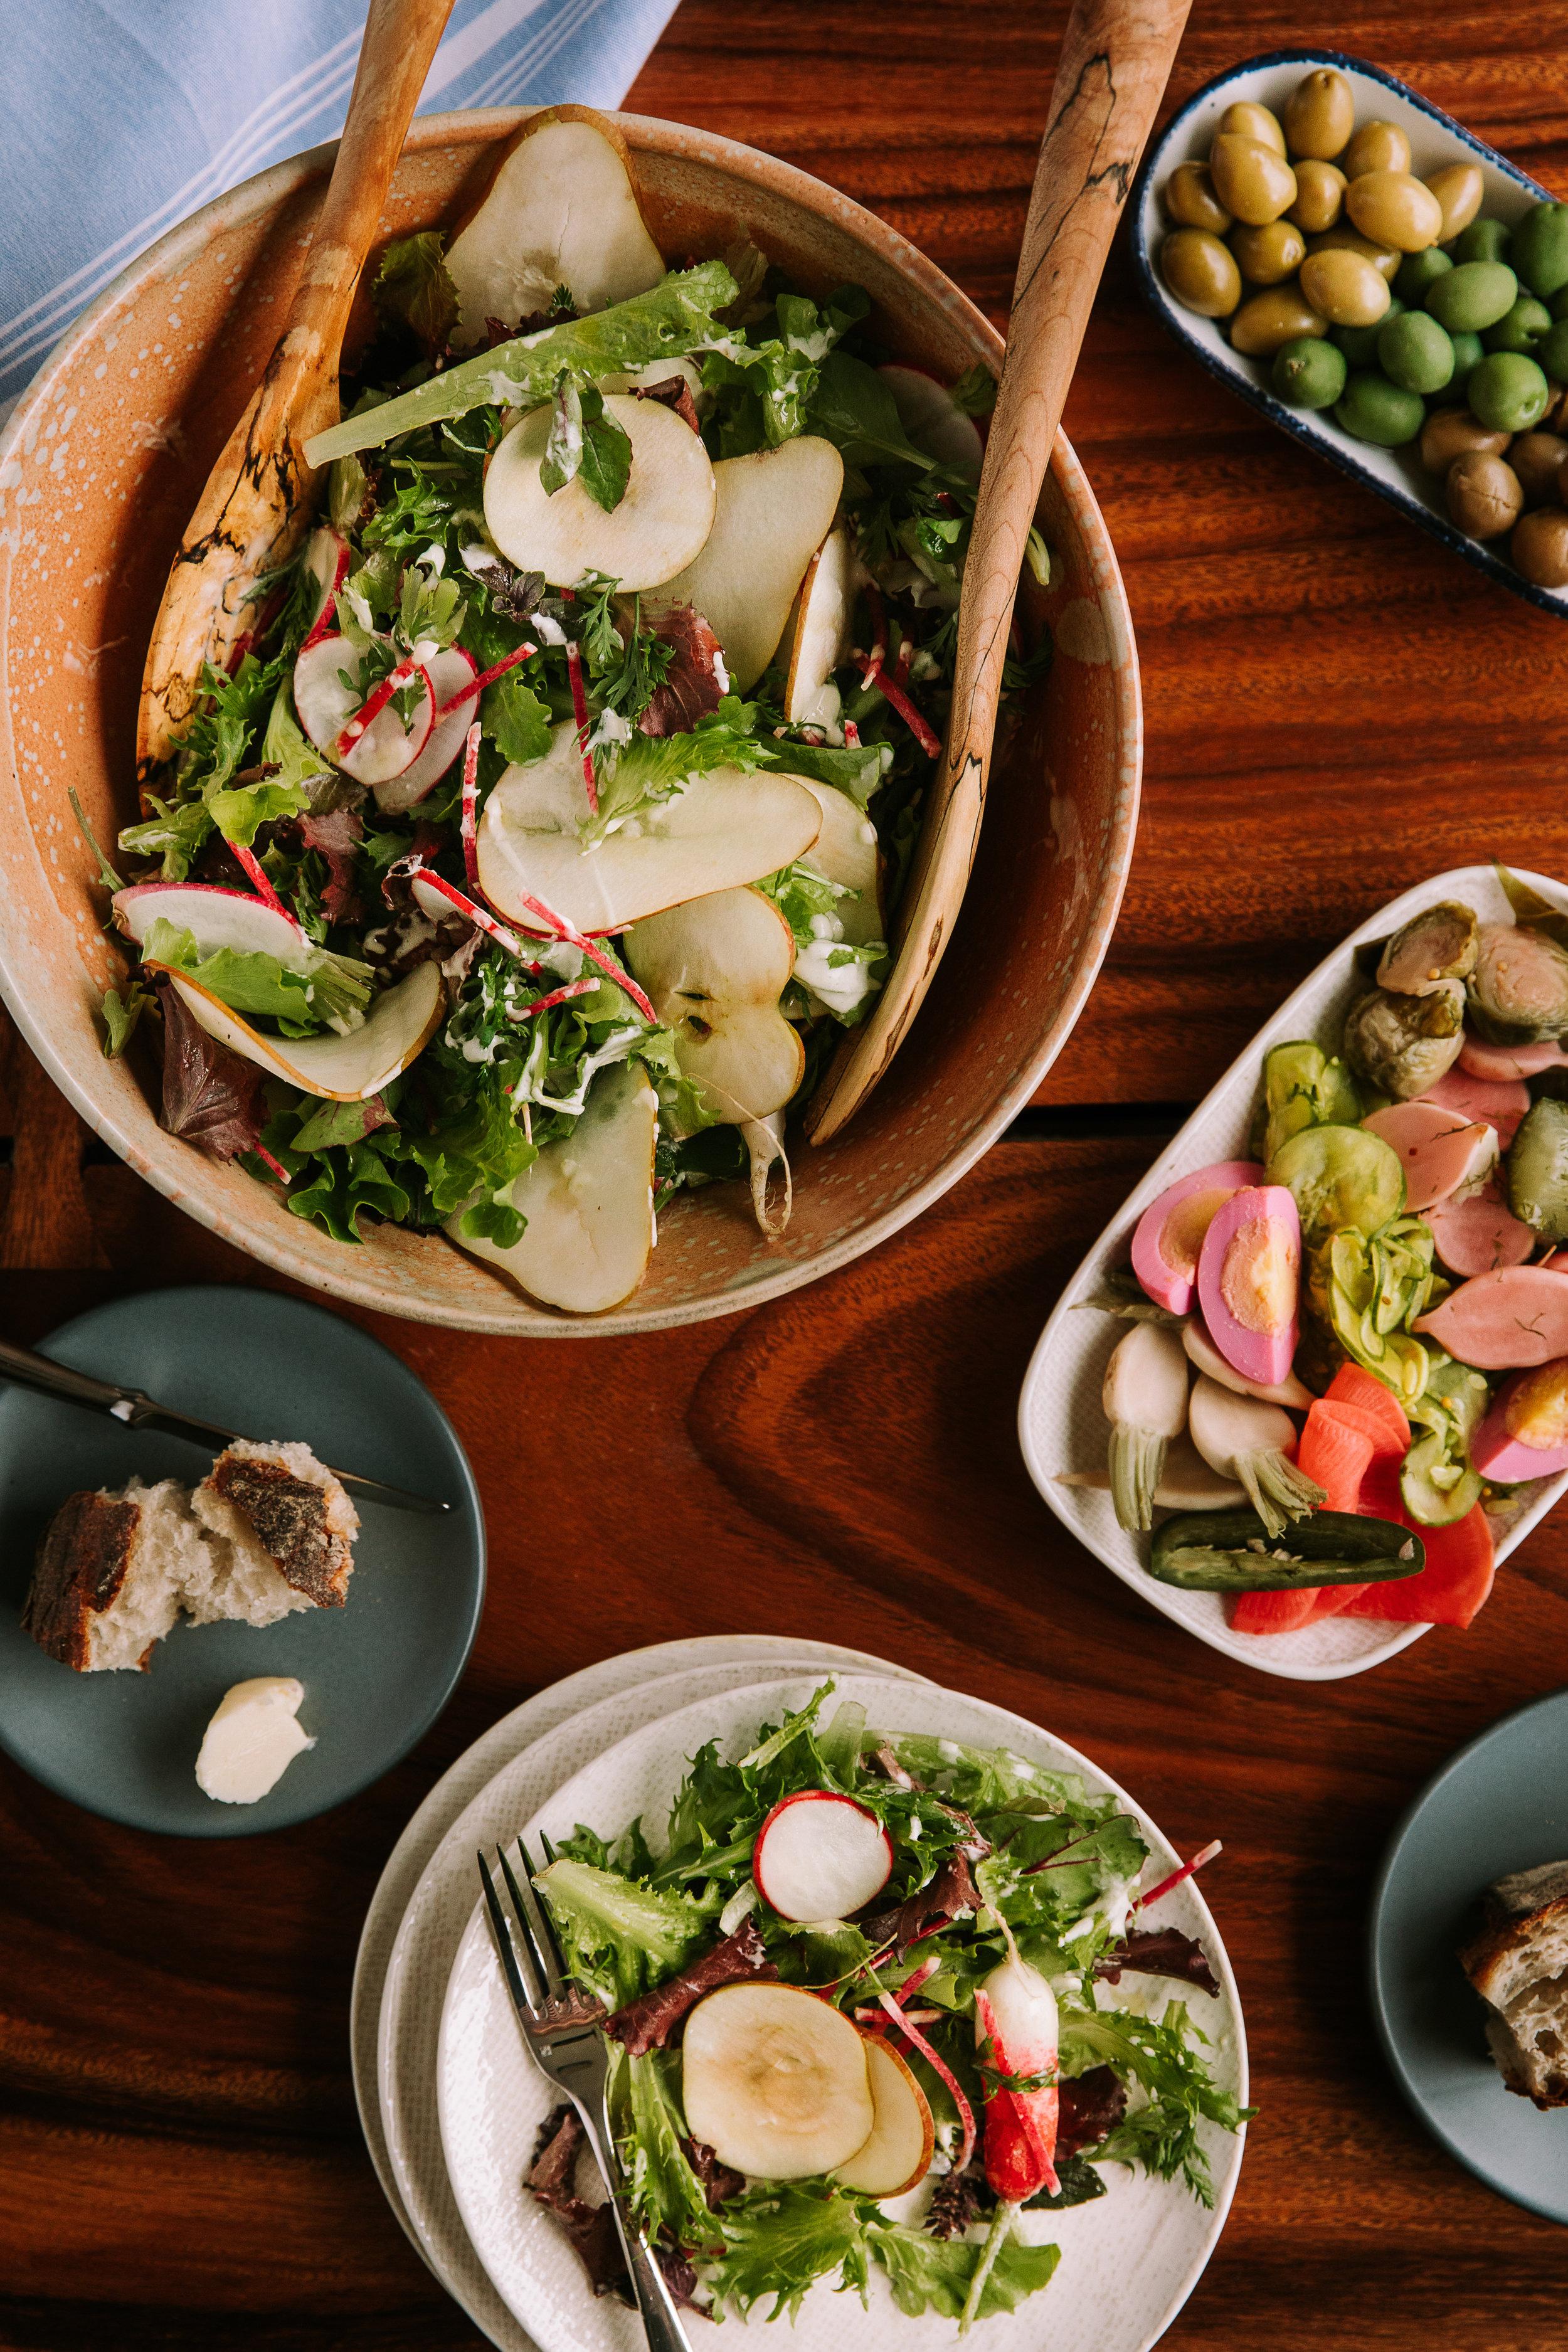 Alcove_Salad, Pickles, Olives_Emily Kan.jpg